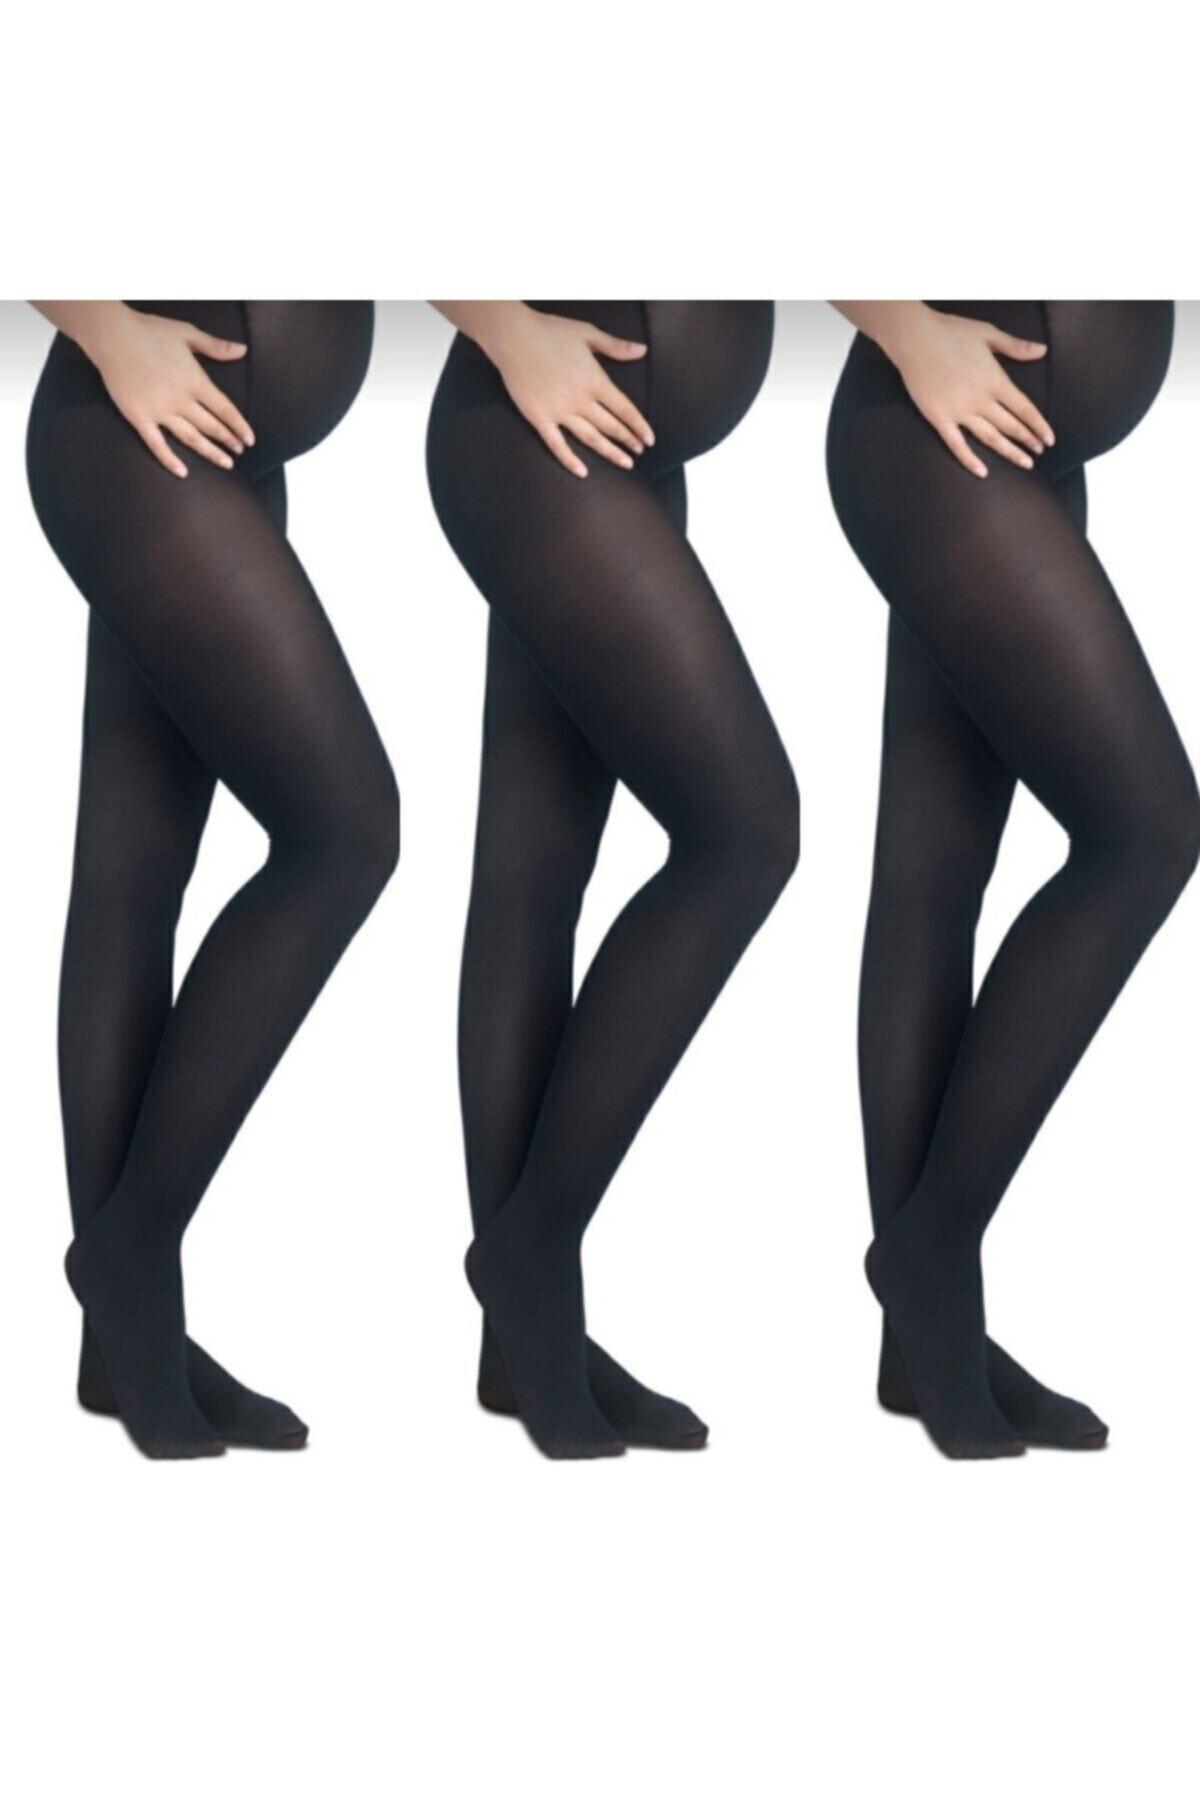 Penti Hamile Külotlu Çorap 40 Denye 3'lü Paket 1